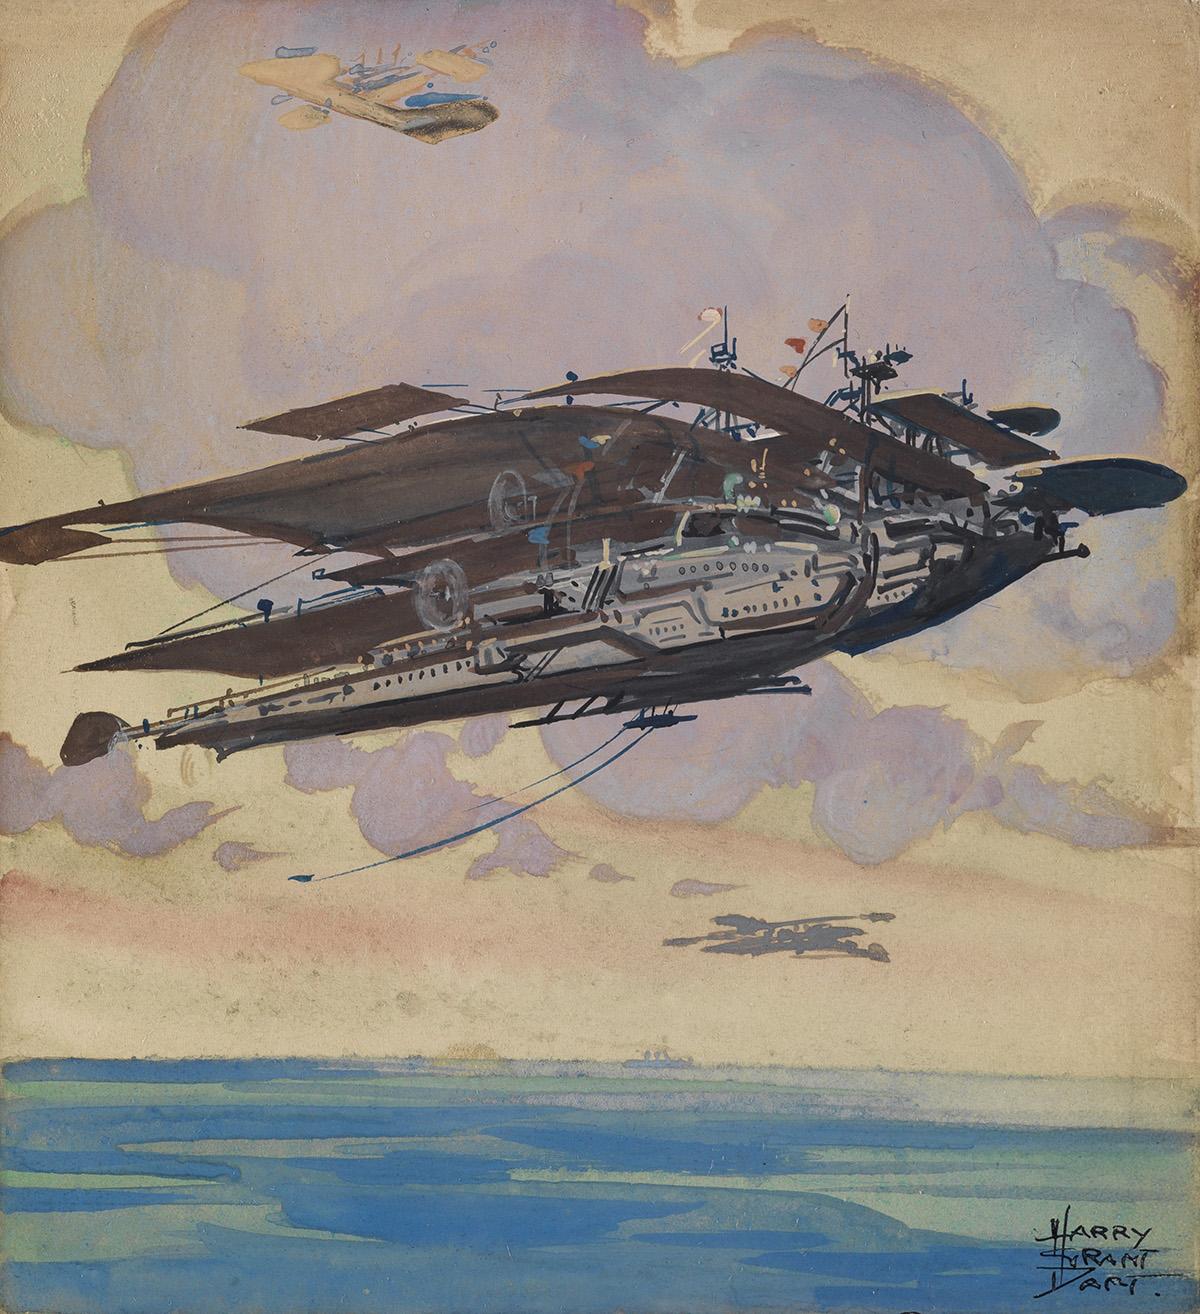 HARRY-GRANT-DART-(AVIATION)-Transport-of-the-Future